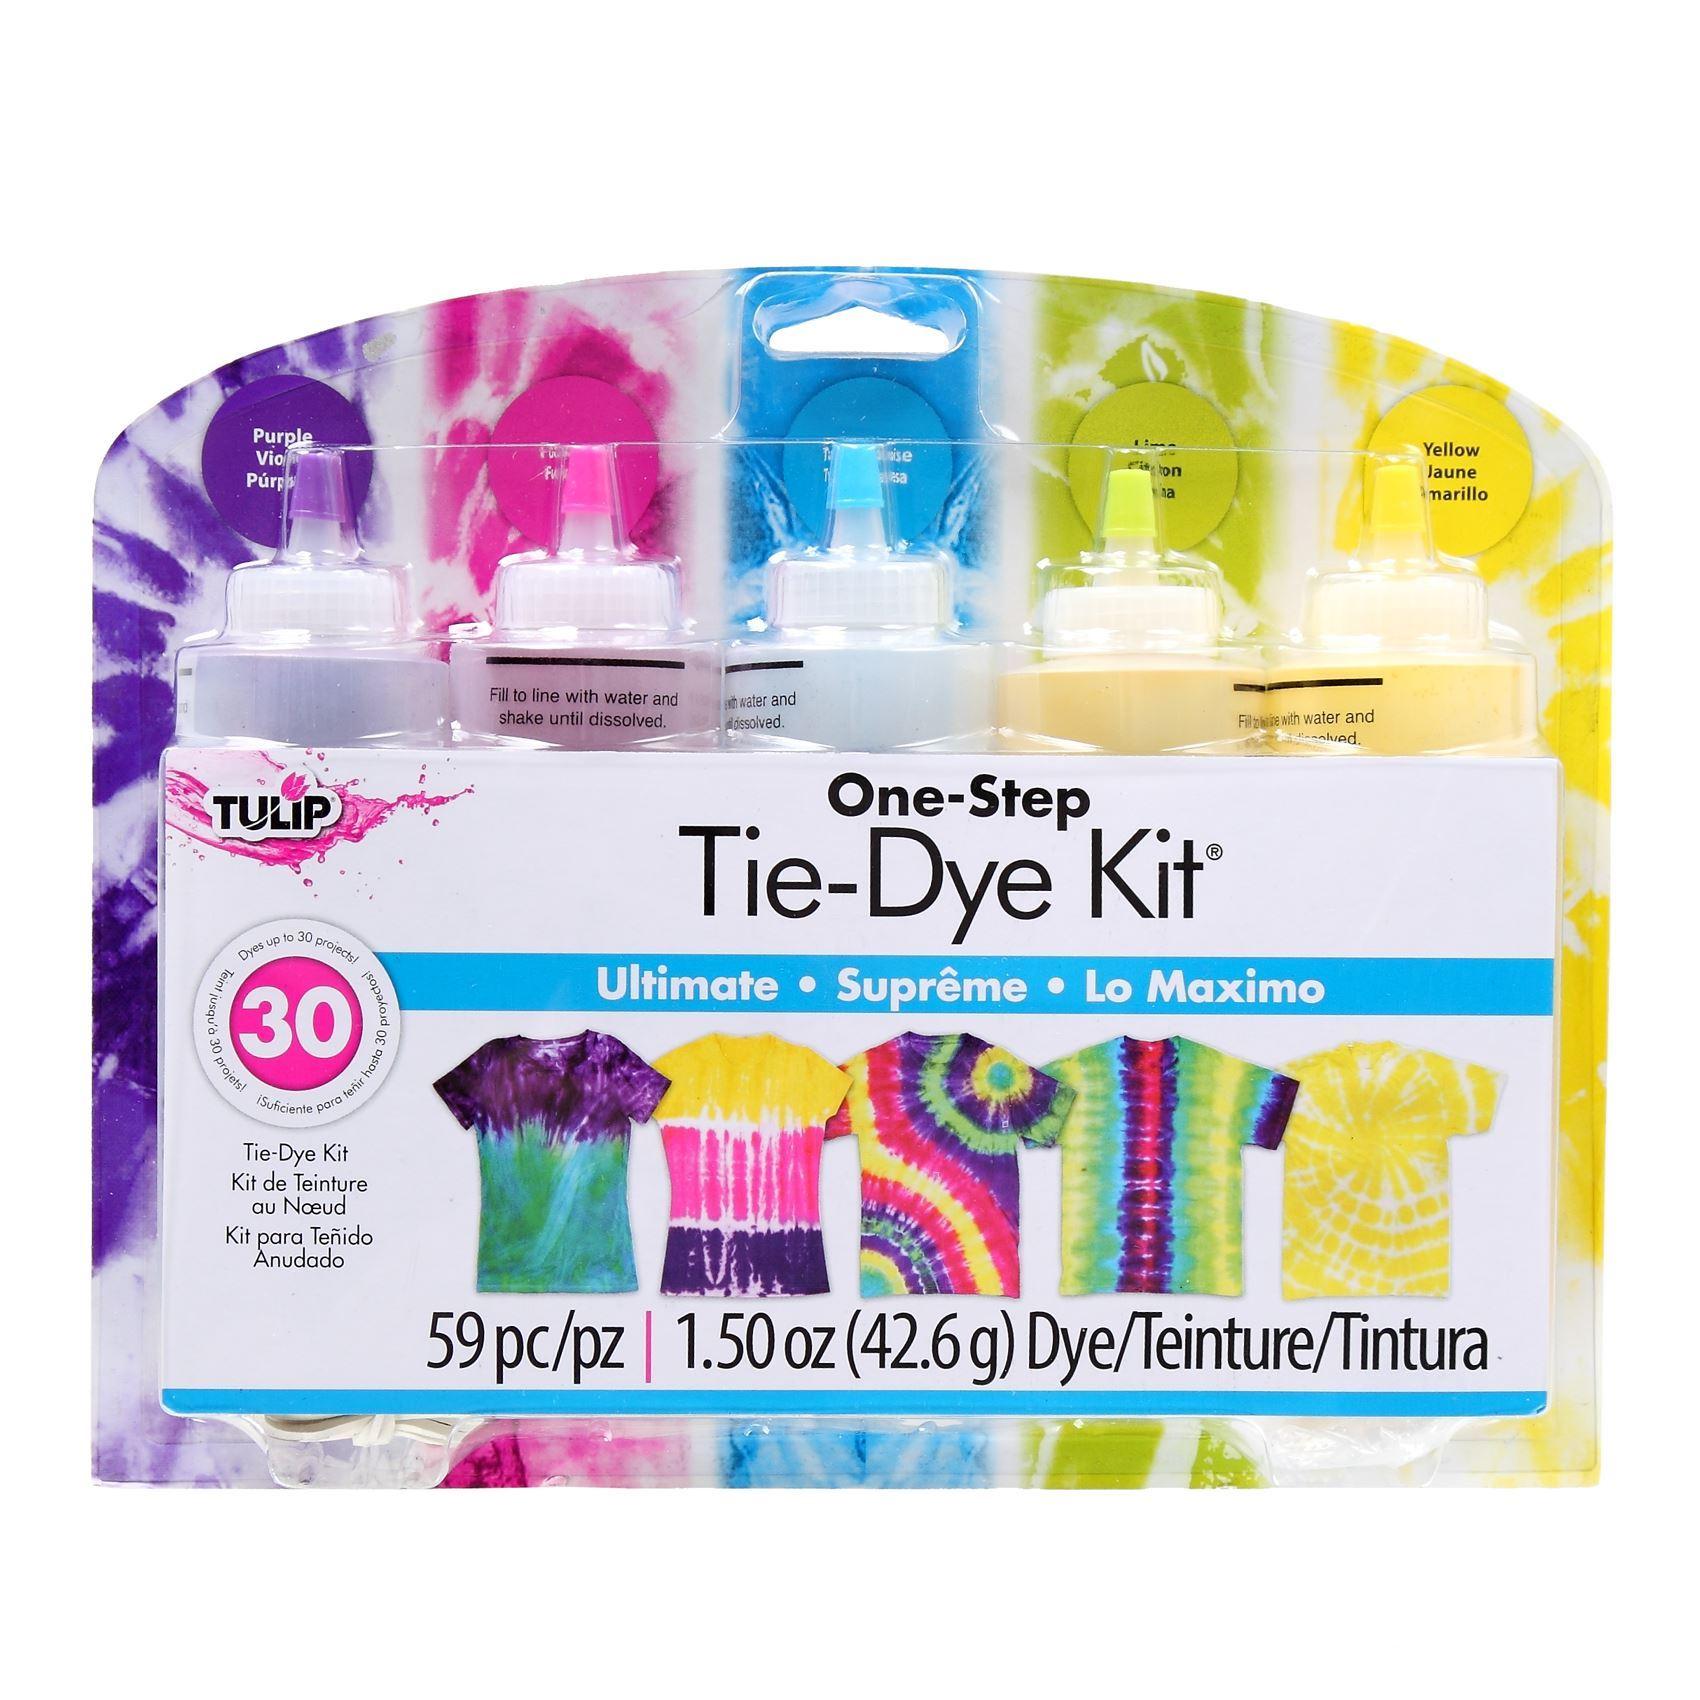 Ultimate 5-Color Tie-Dye Kit